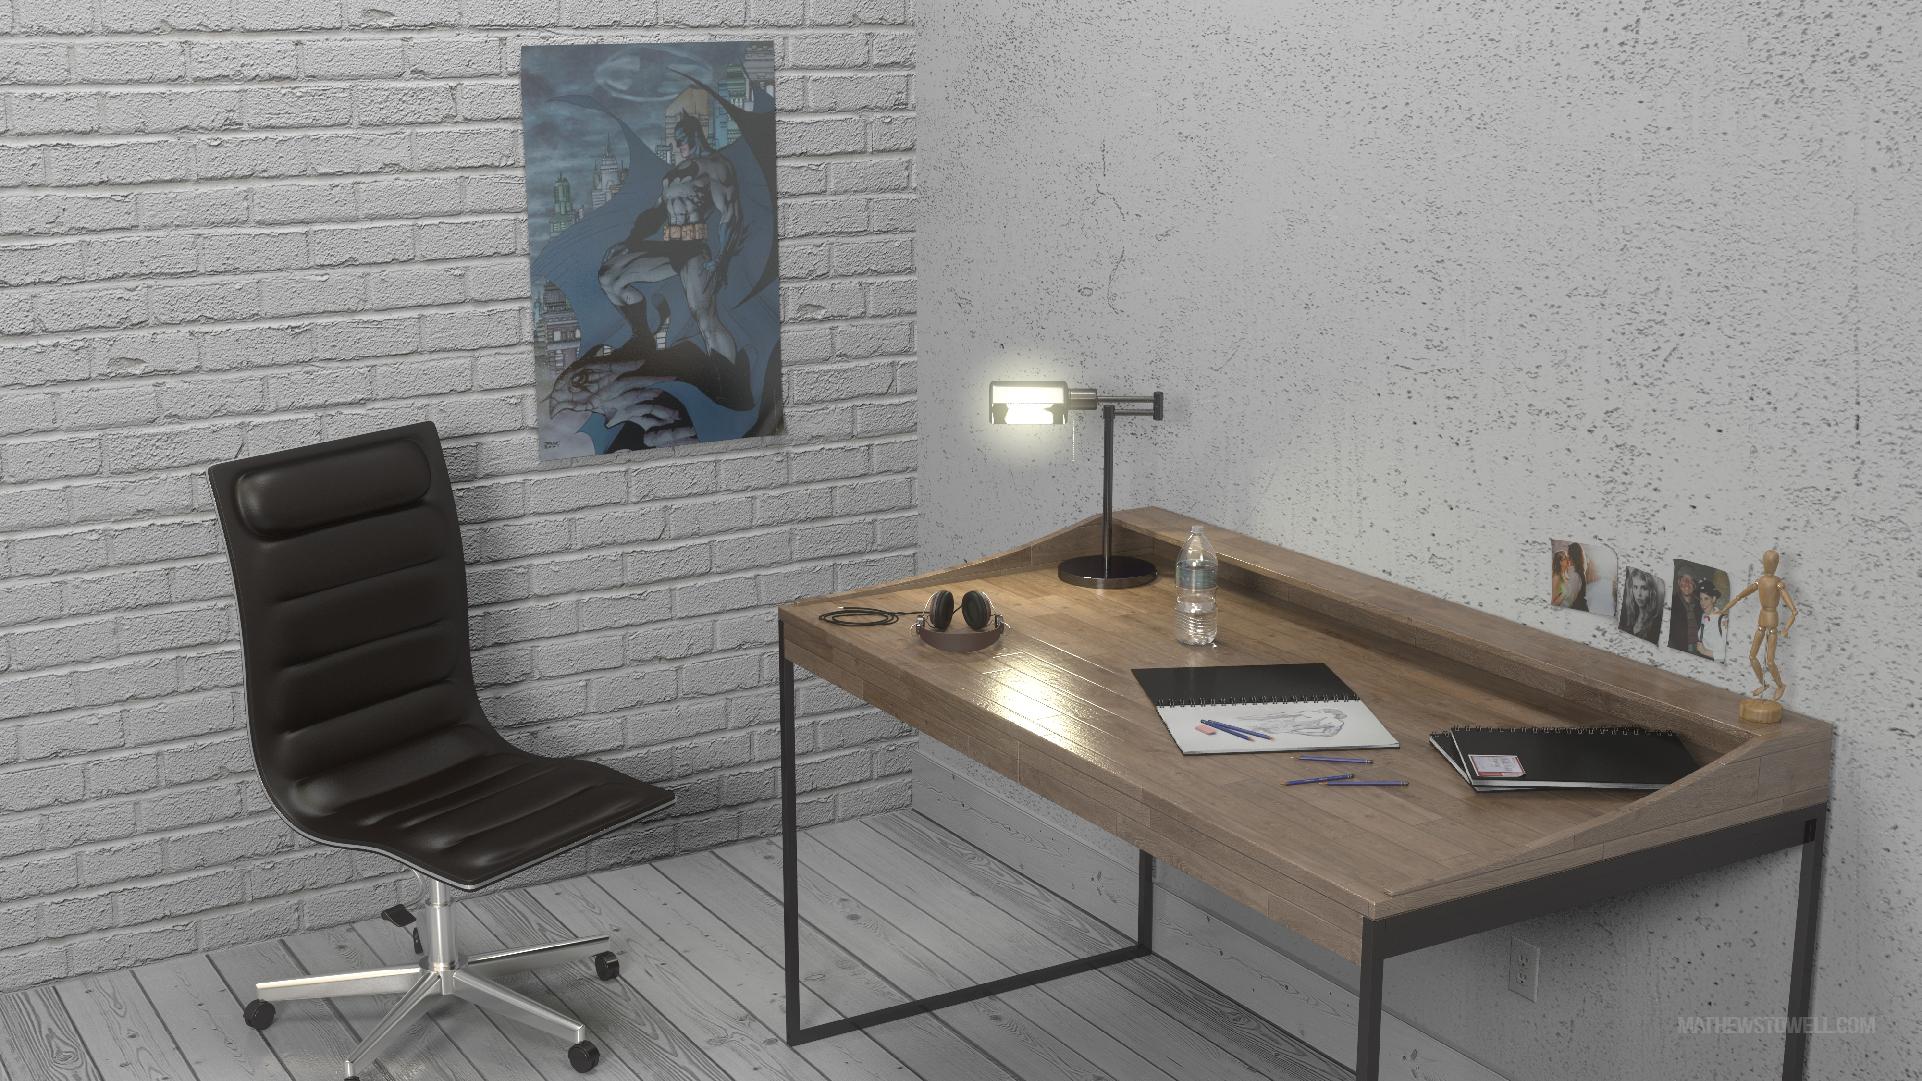 VRay Desk Scene | Mathew Stowell's Portfolio